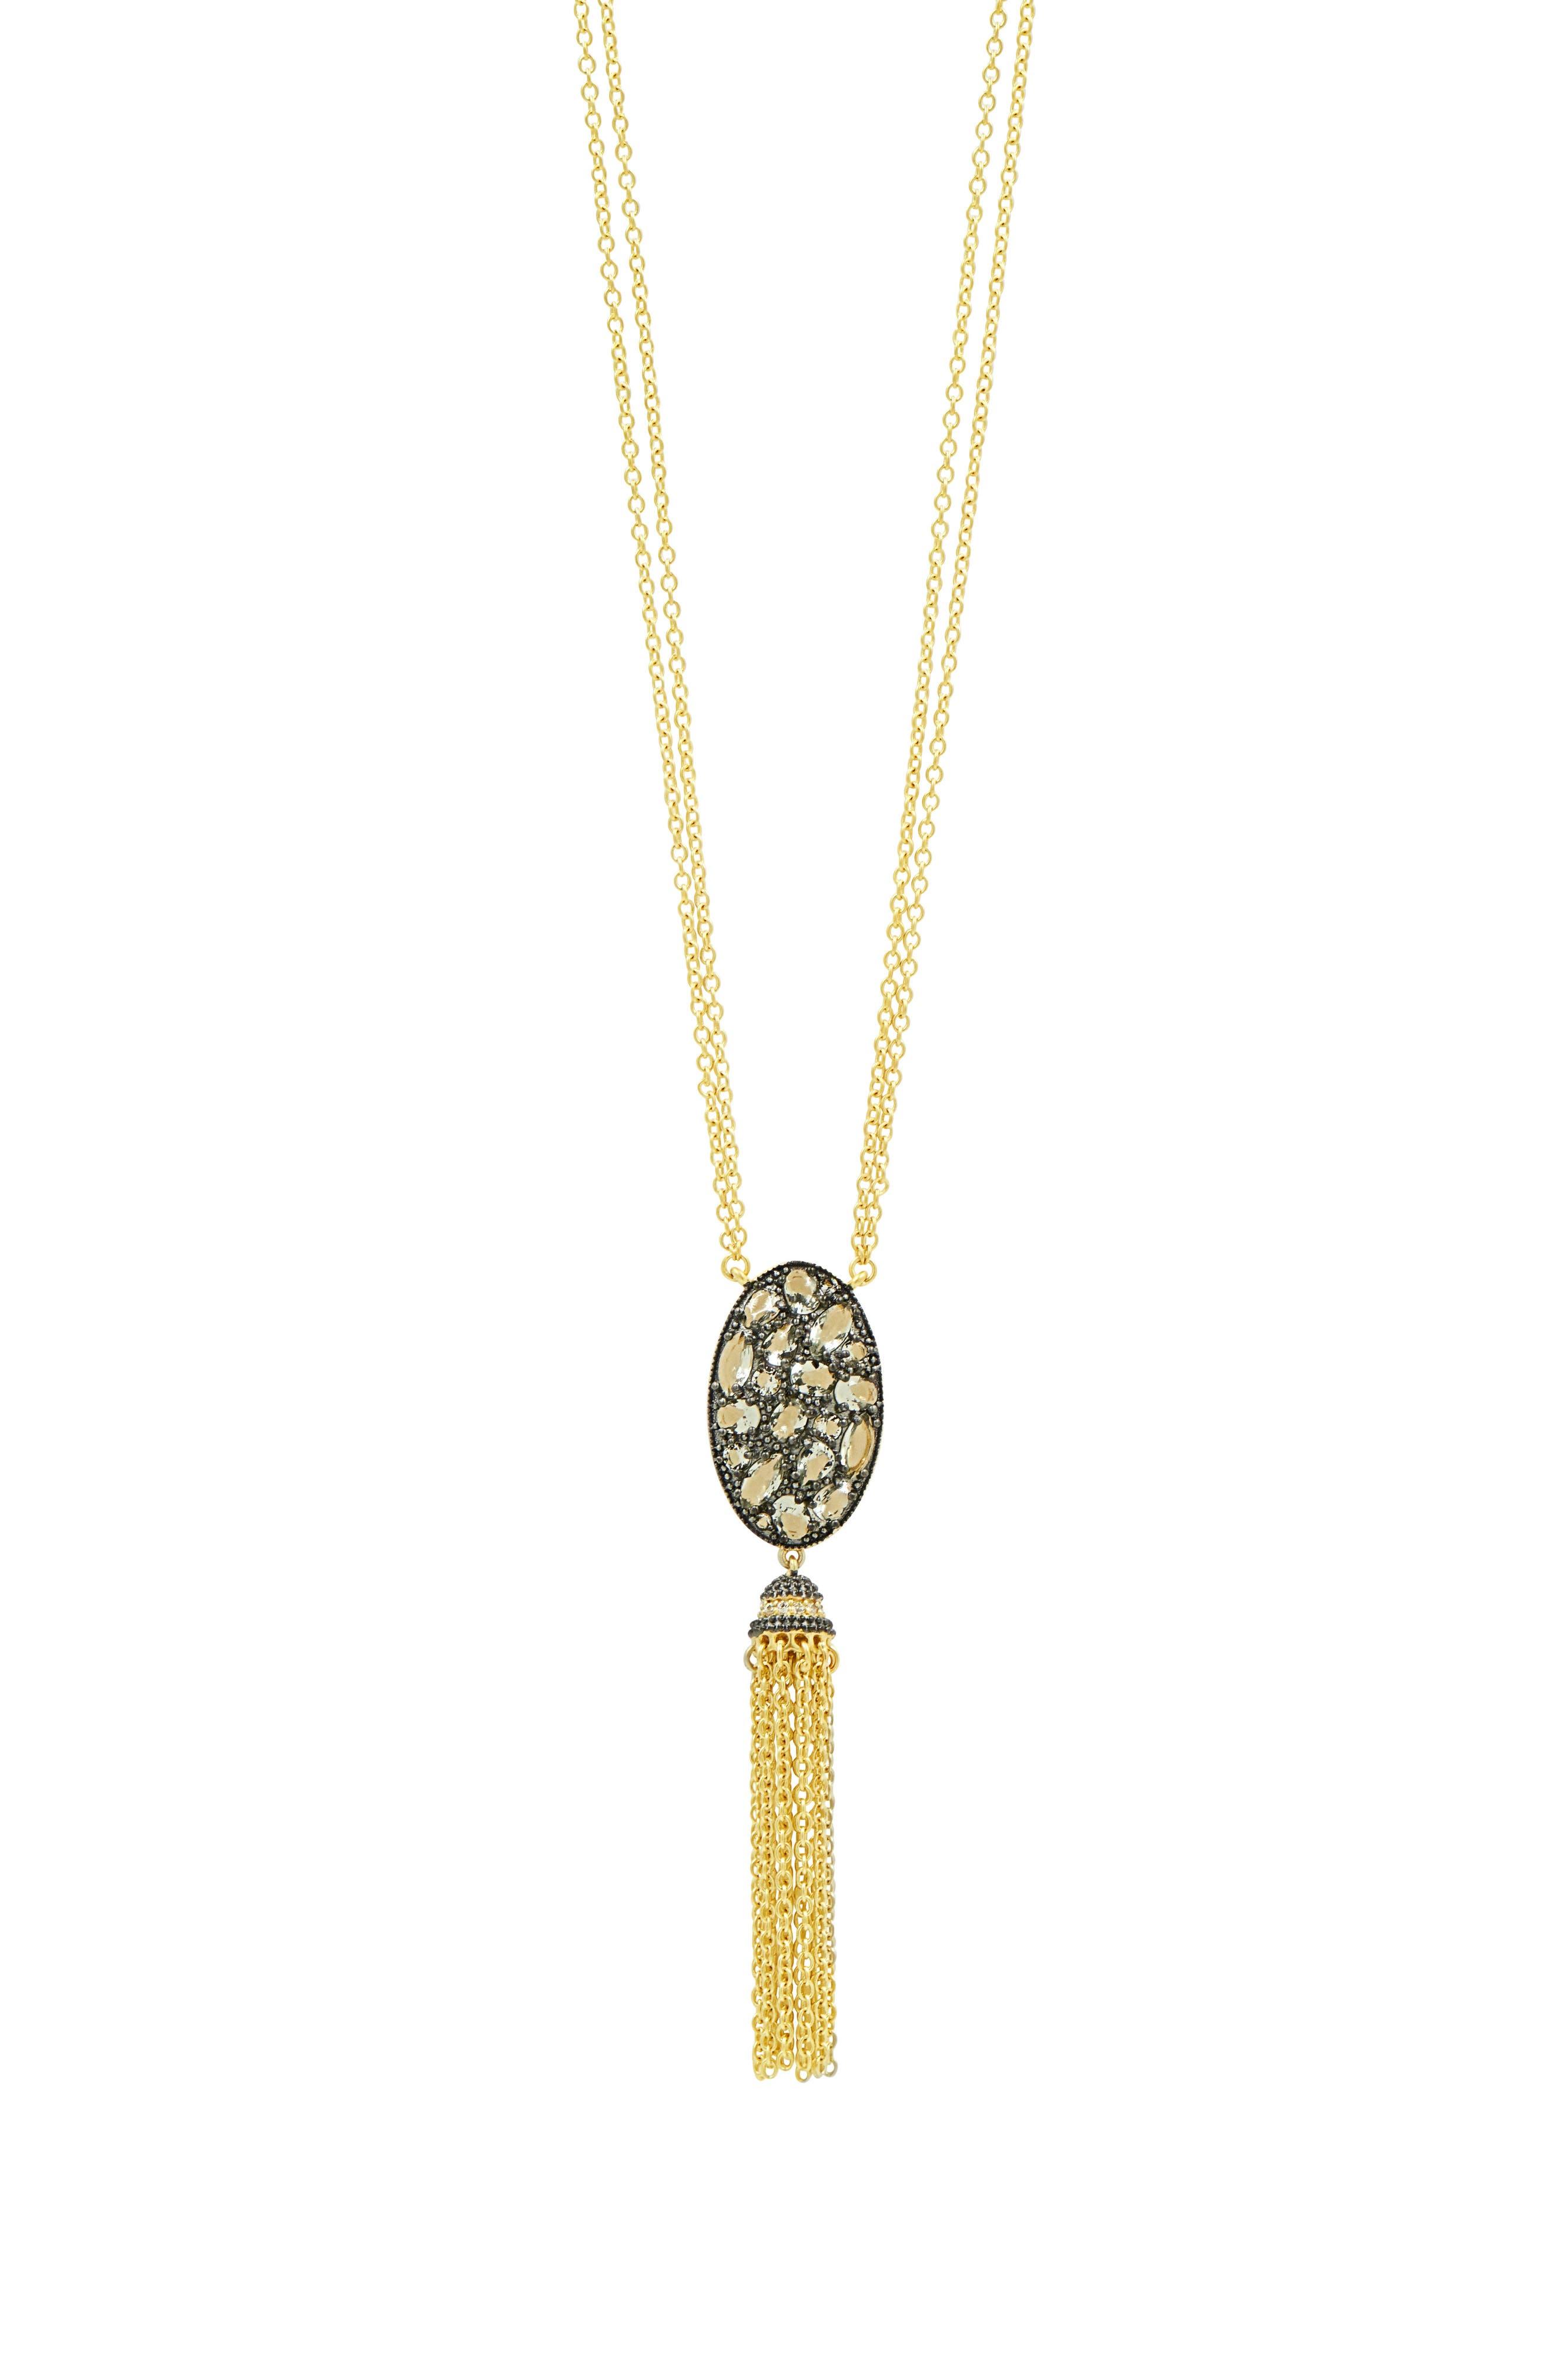 Rose Dor Tassel Pendant Necklace,                             Main thumbnail 1, color,                             BLACK/ GOLD